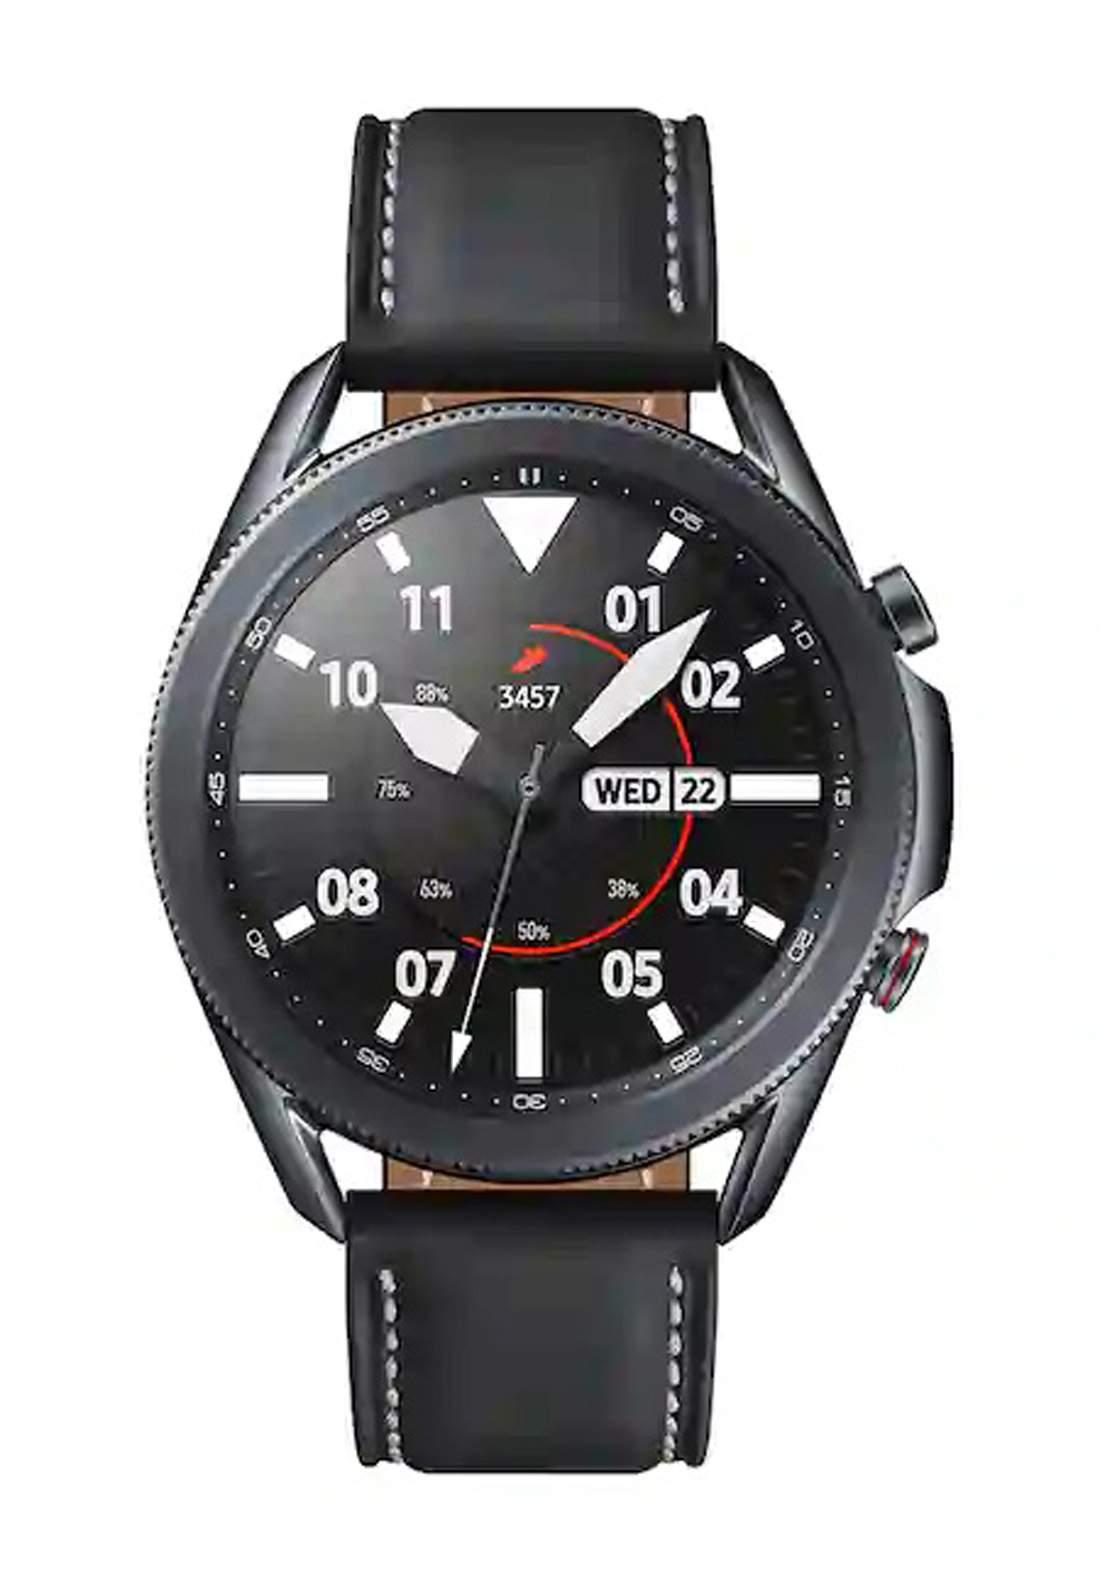 Samsung Galaxy Watch 3 Smart Watch - Black ساعة ذكية